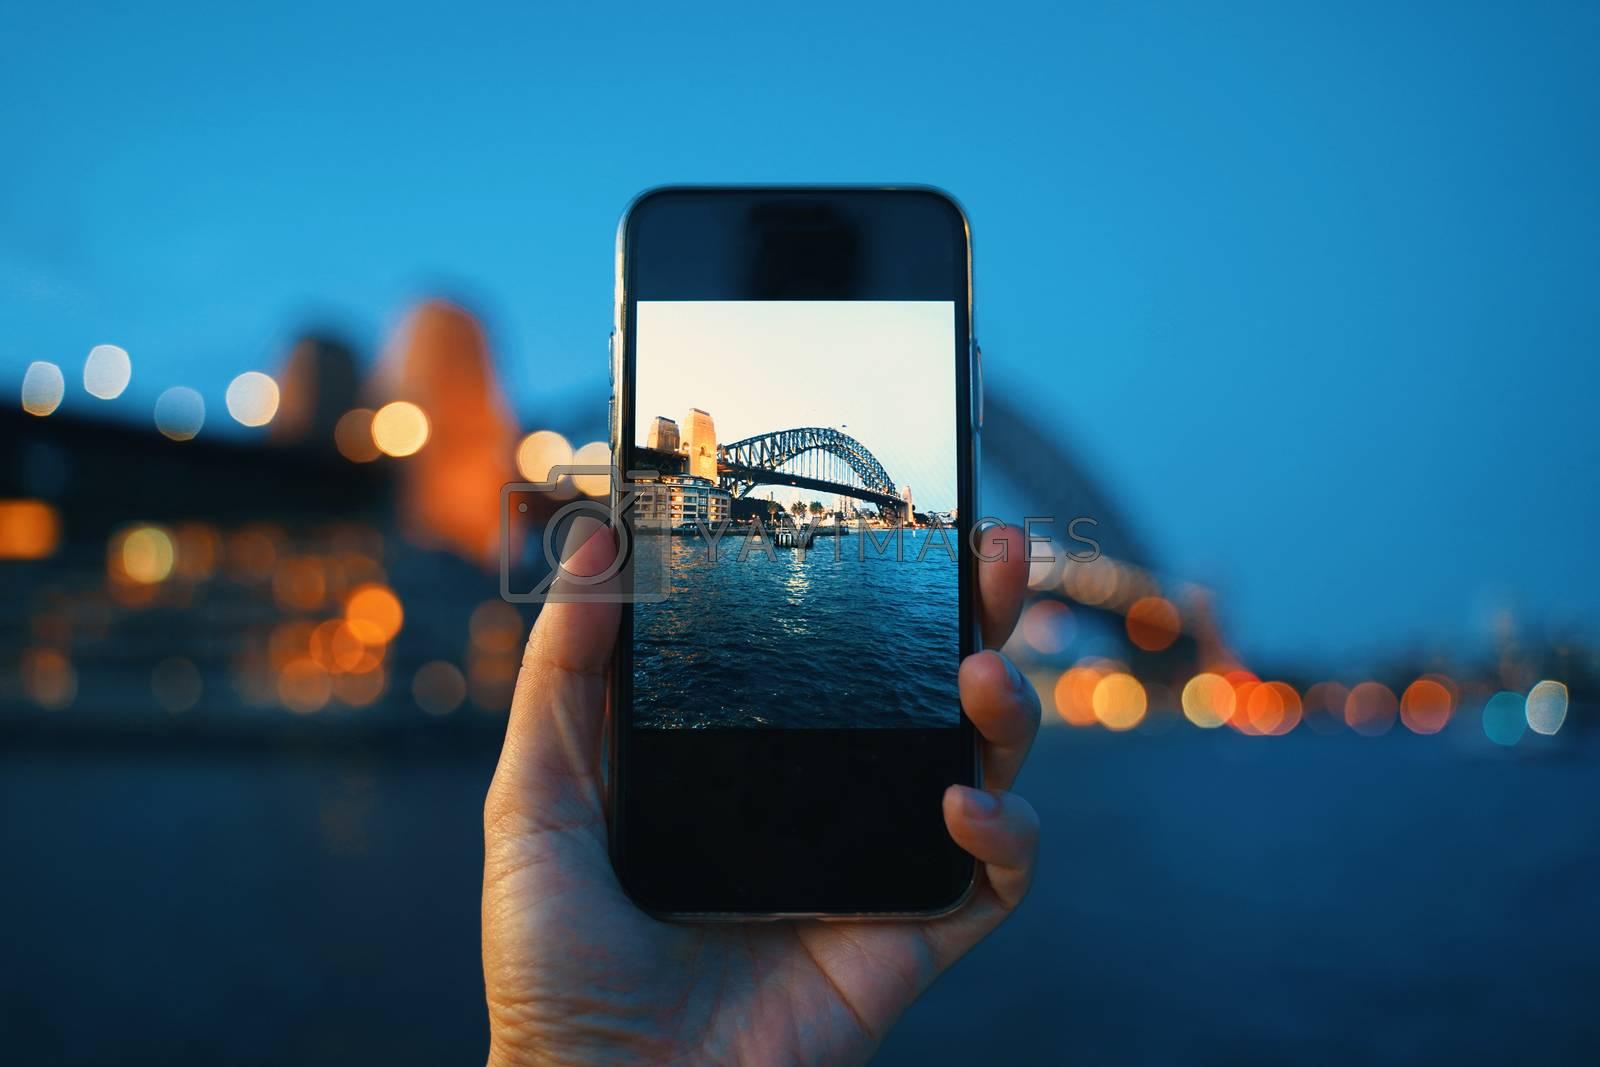 Hand holding smartphone screen taking photo of Sydney Harbour Bridge at night, Sydney in Australia